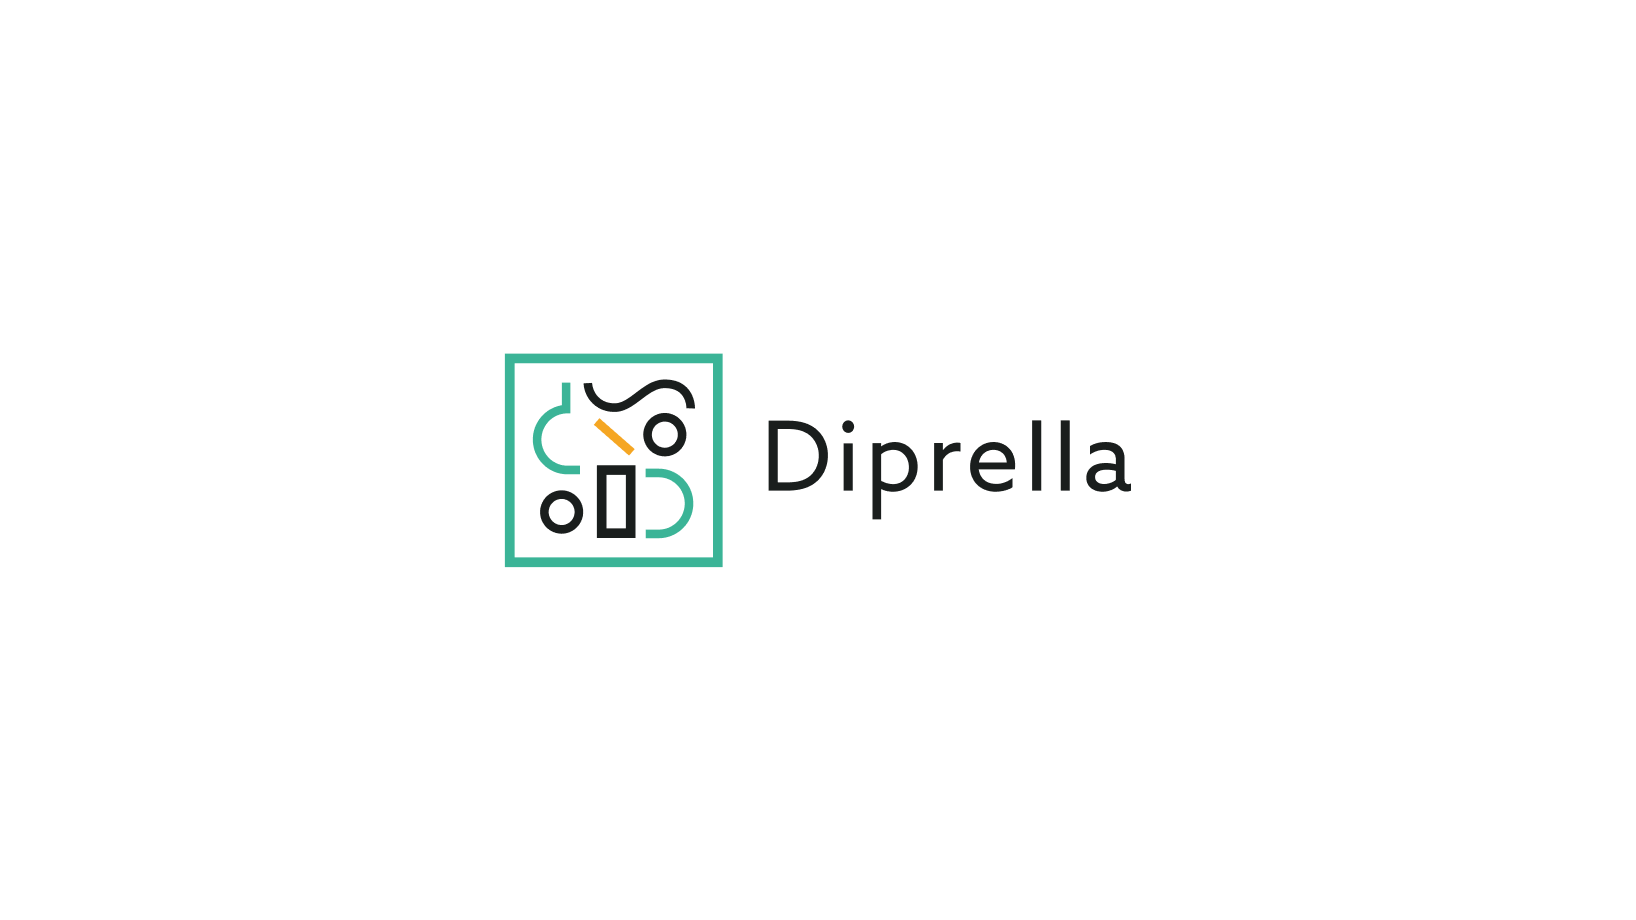 Diprella brand logo